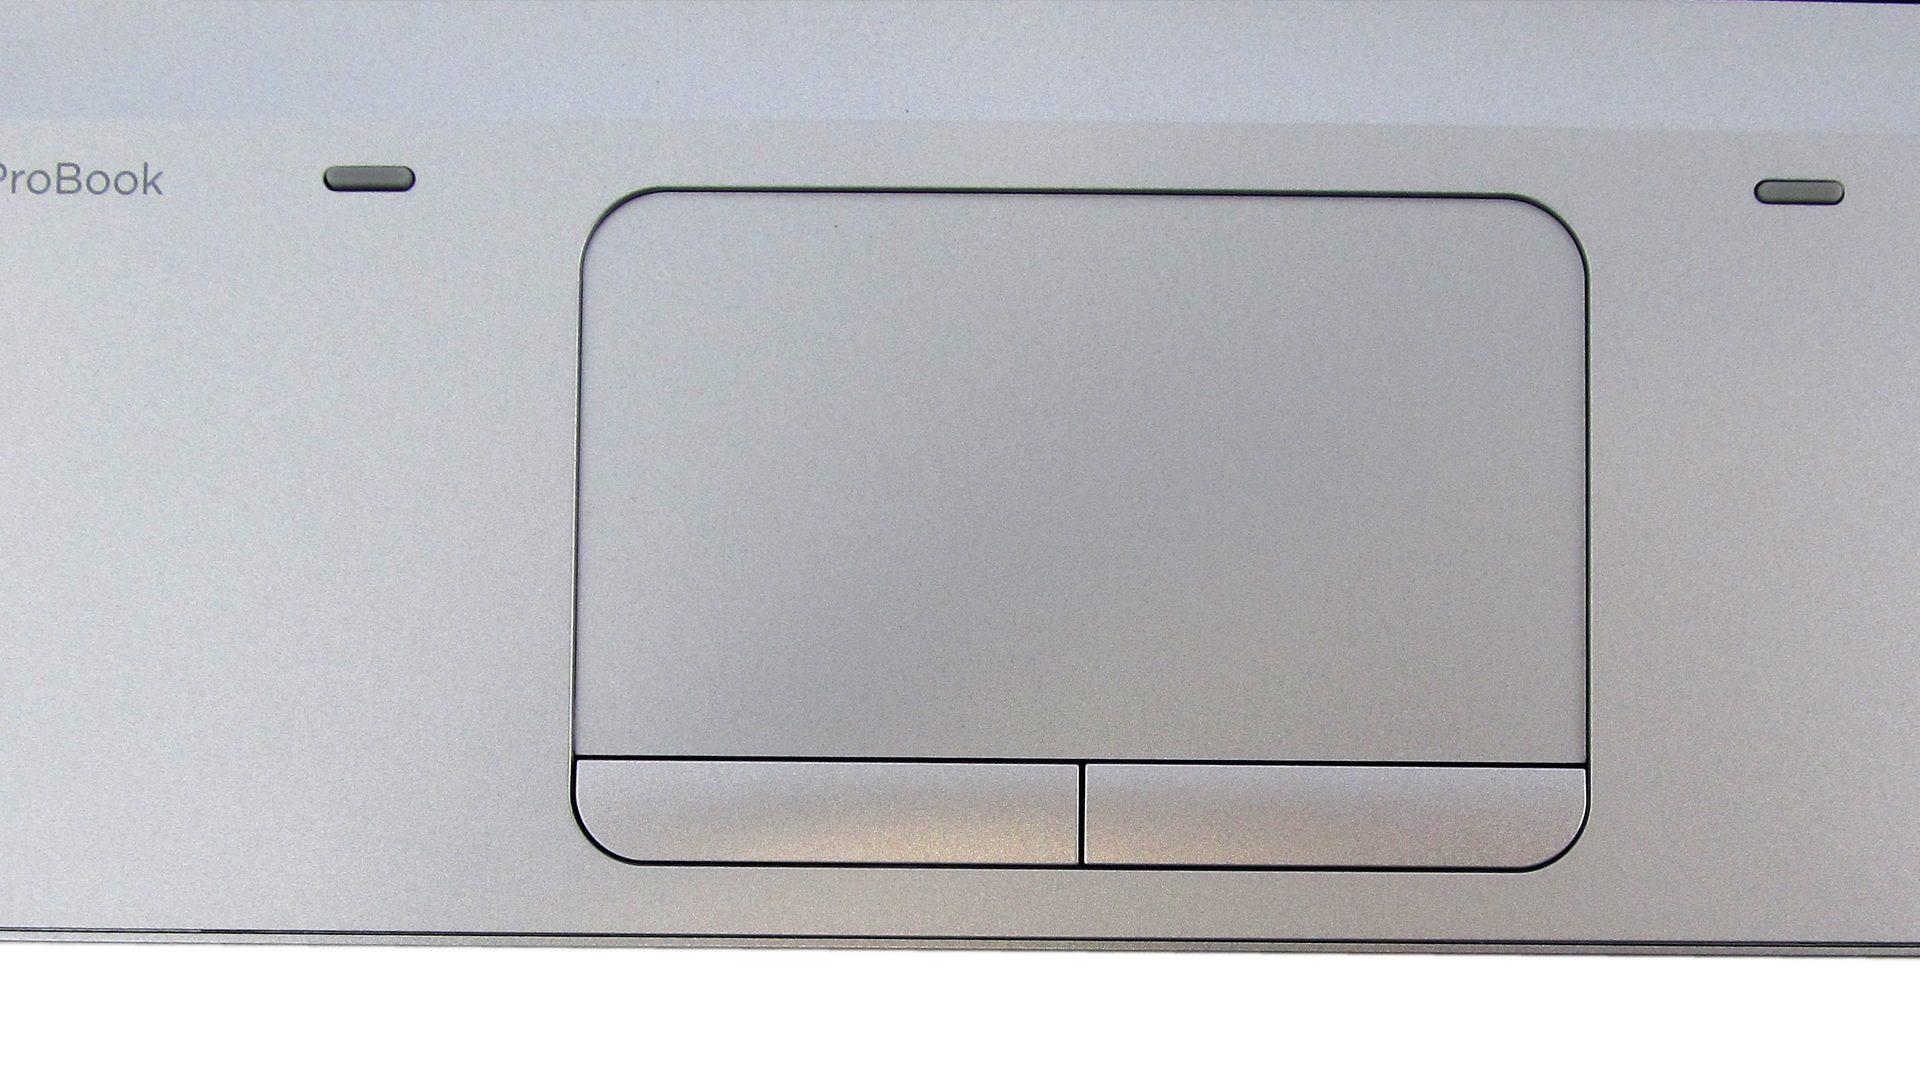 HP ProBook 650 G2 Tastatur_2